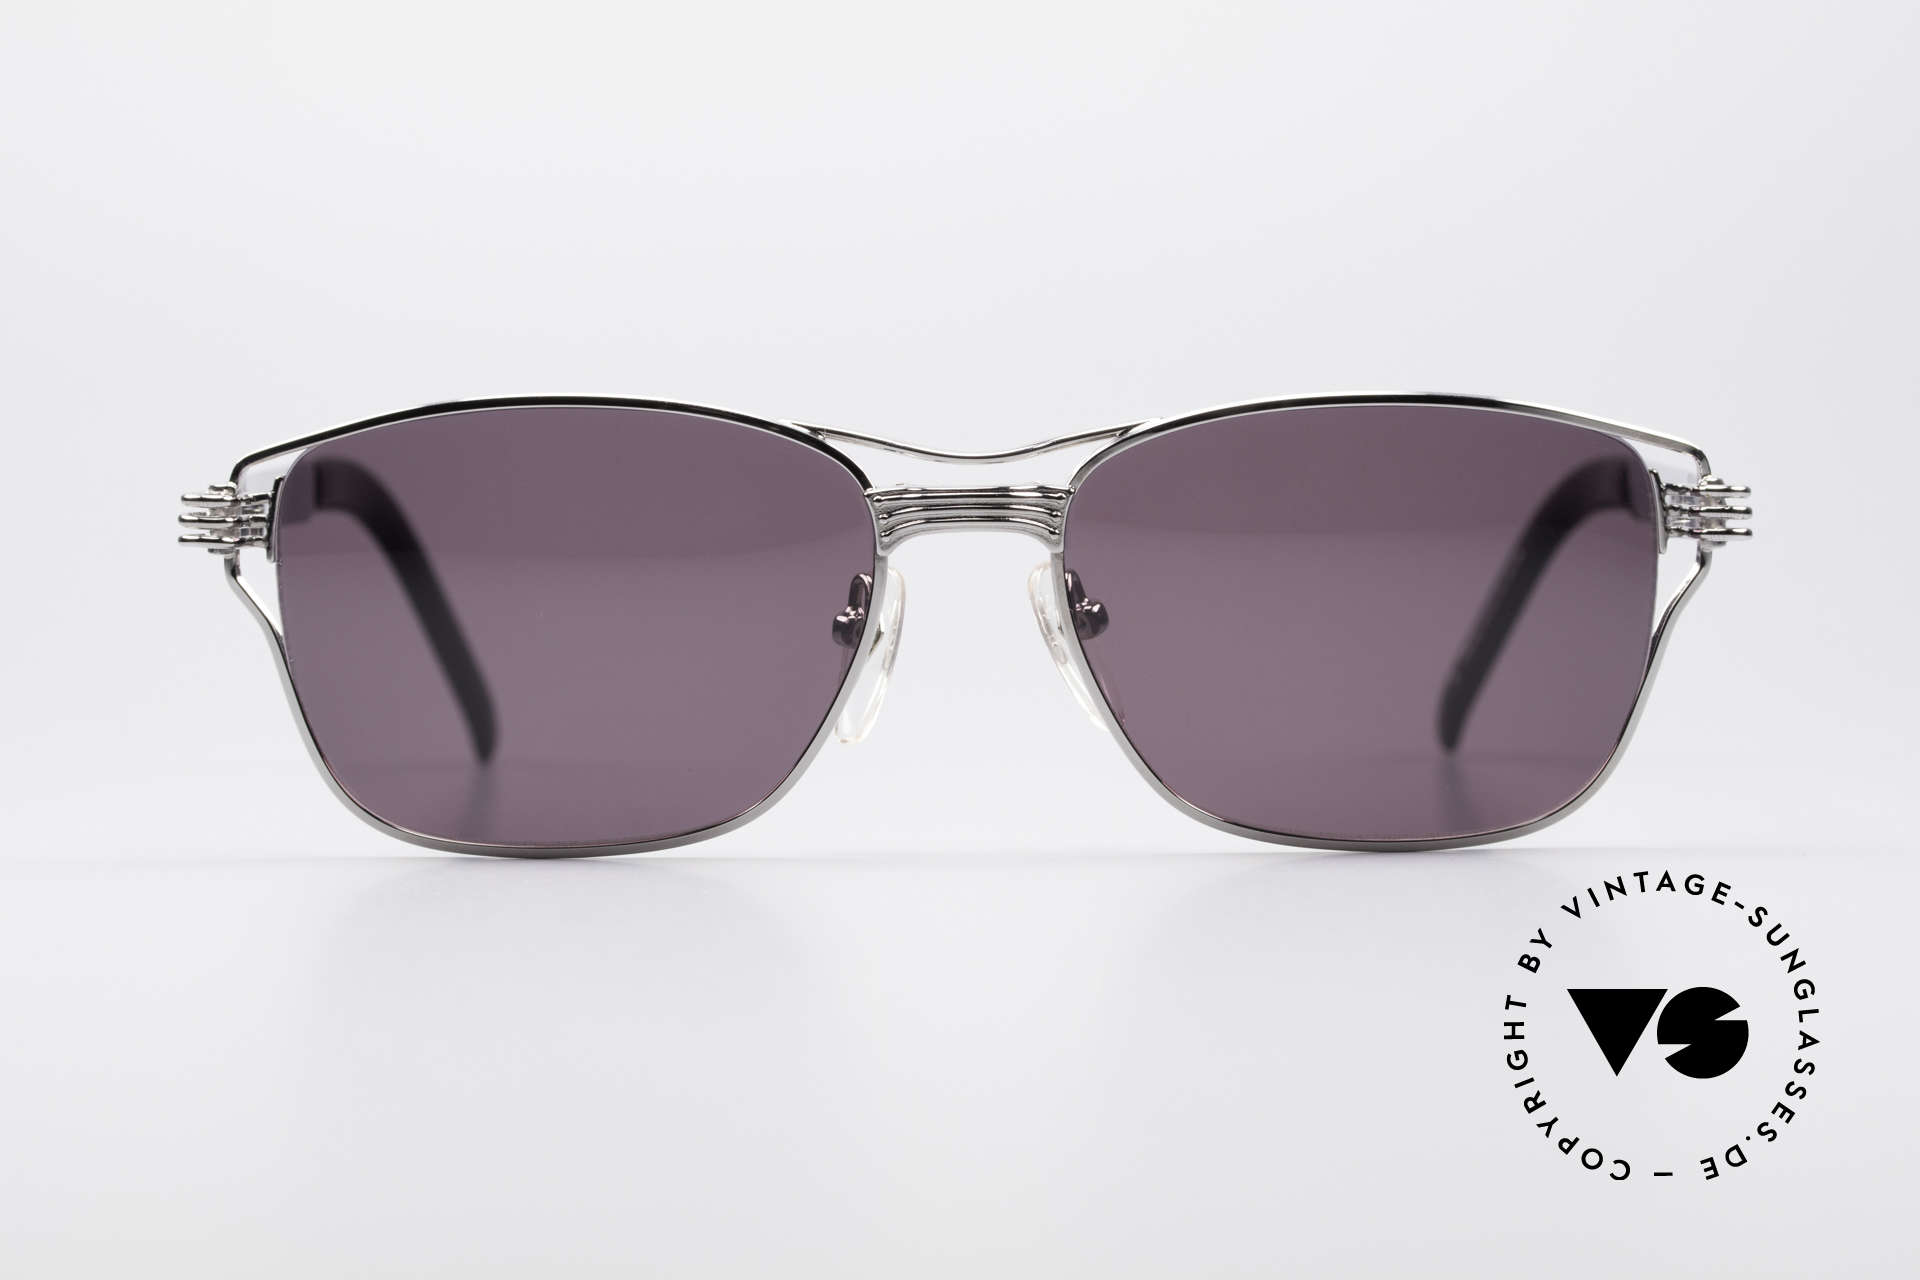 Jean Paul Gaultier 56-4173 Striking Square Sunglasses, mechanical / industrial design (distinctive JPG), Made for Men